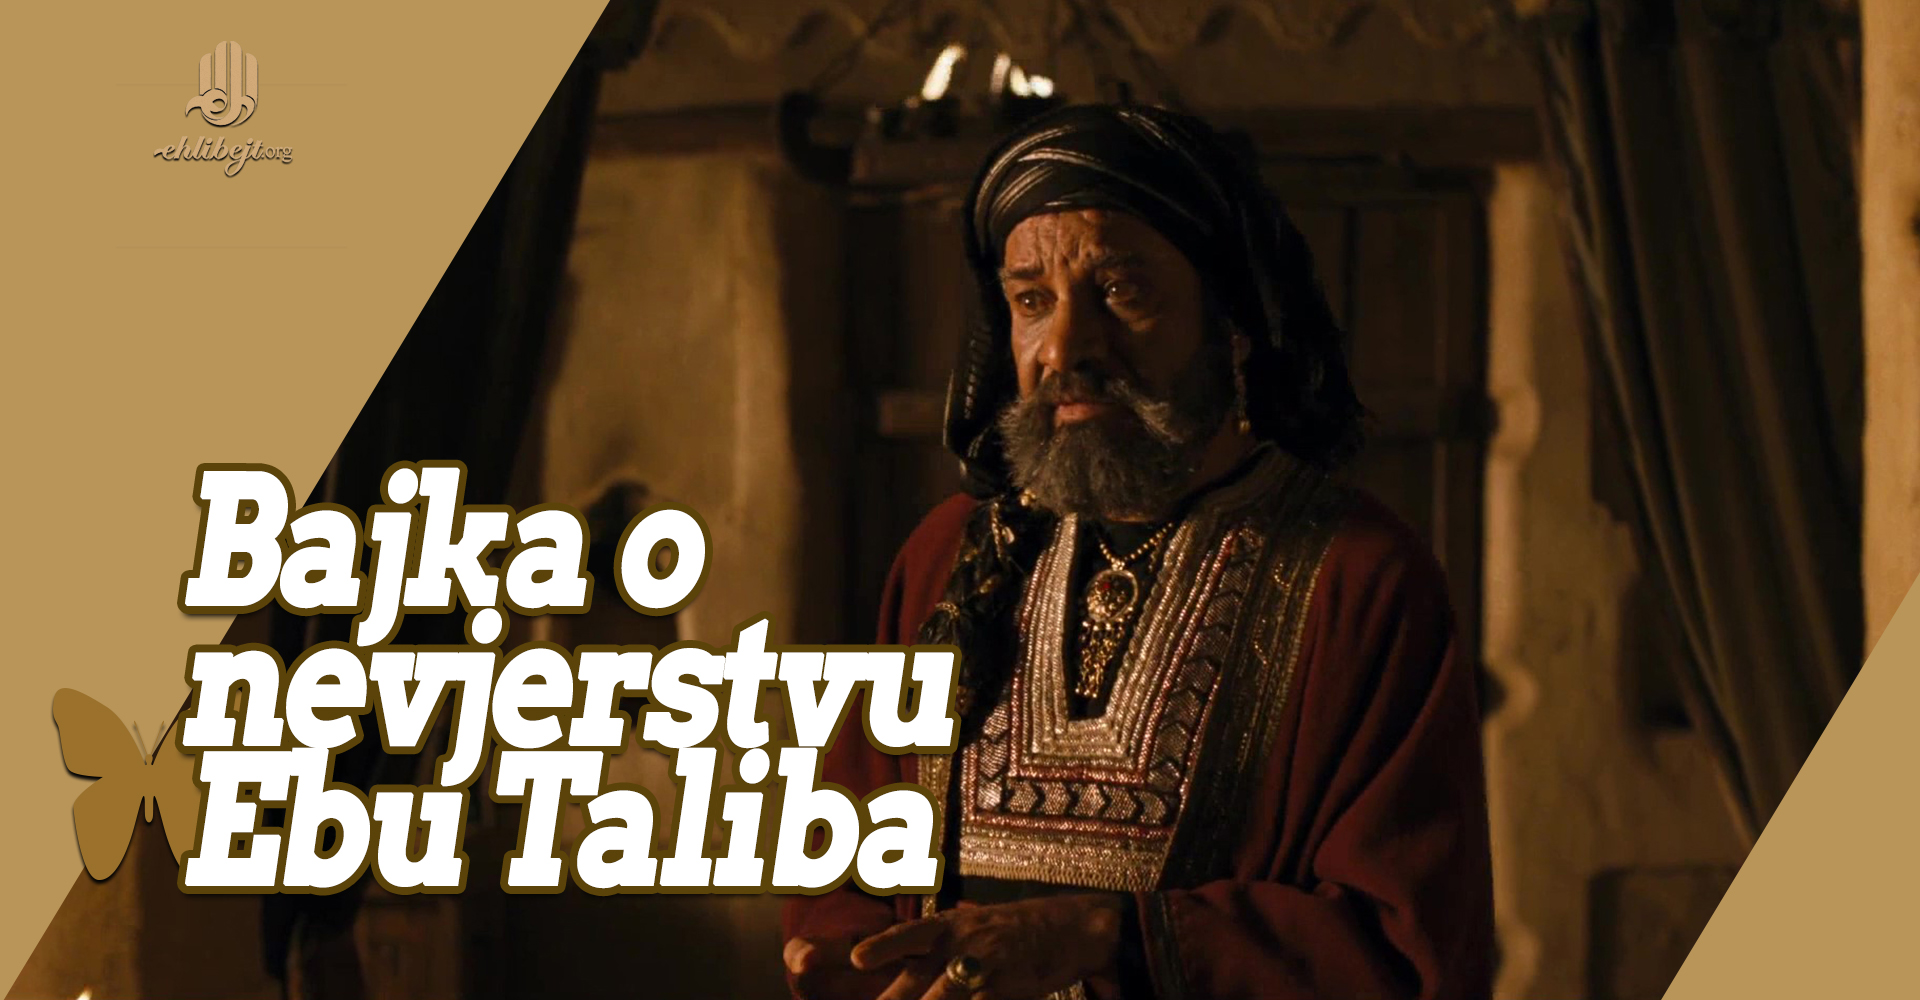 Bajka o nevjerstvu Ebu Taliba, r.a.